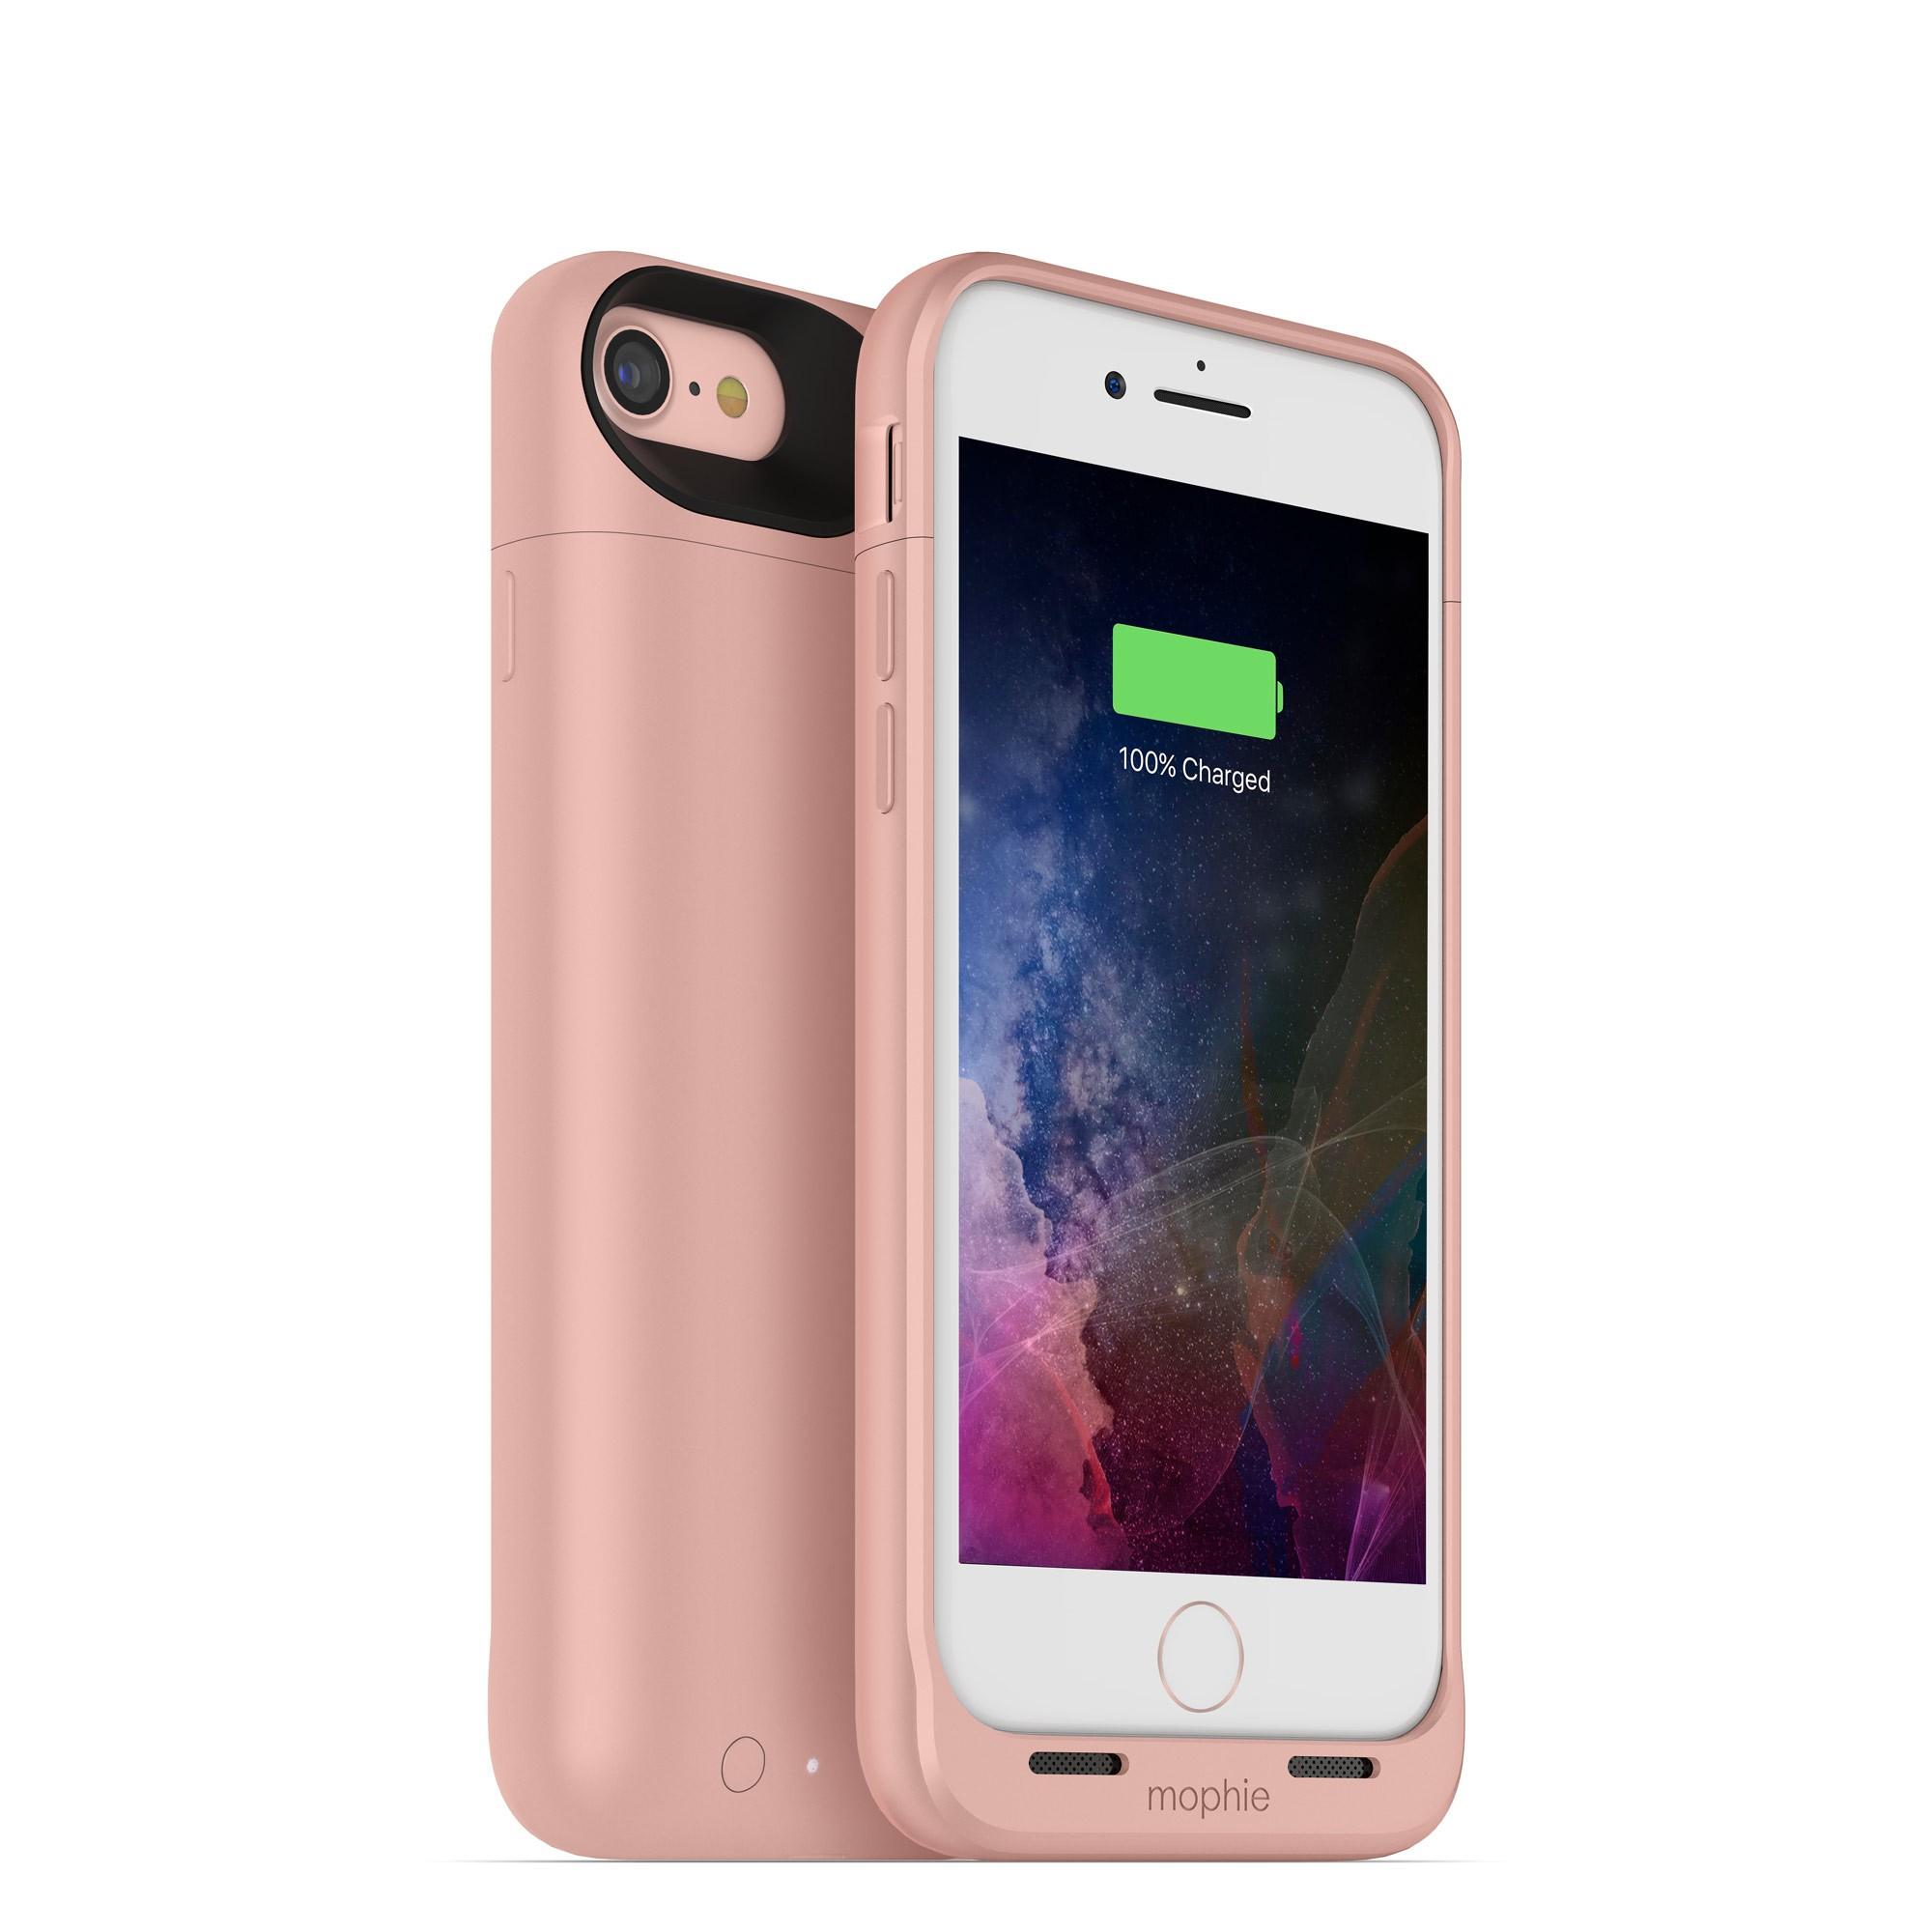 Nabíjecí pouzdro pro Apple iPhone 7 / 8 - Mophie, Juice Pack Air 2525mAh Rose Gold